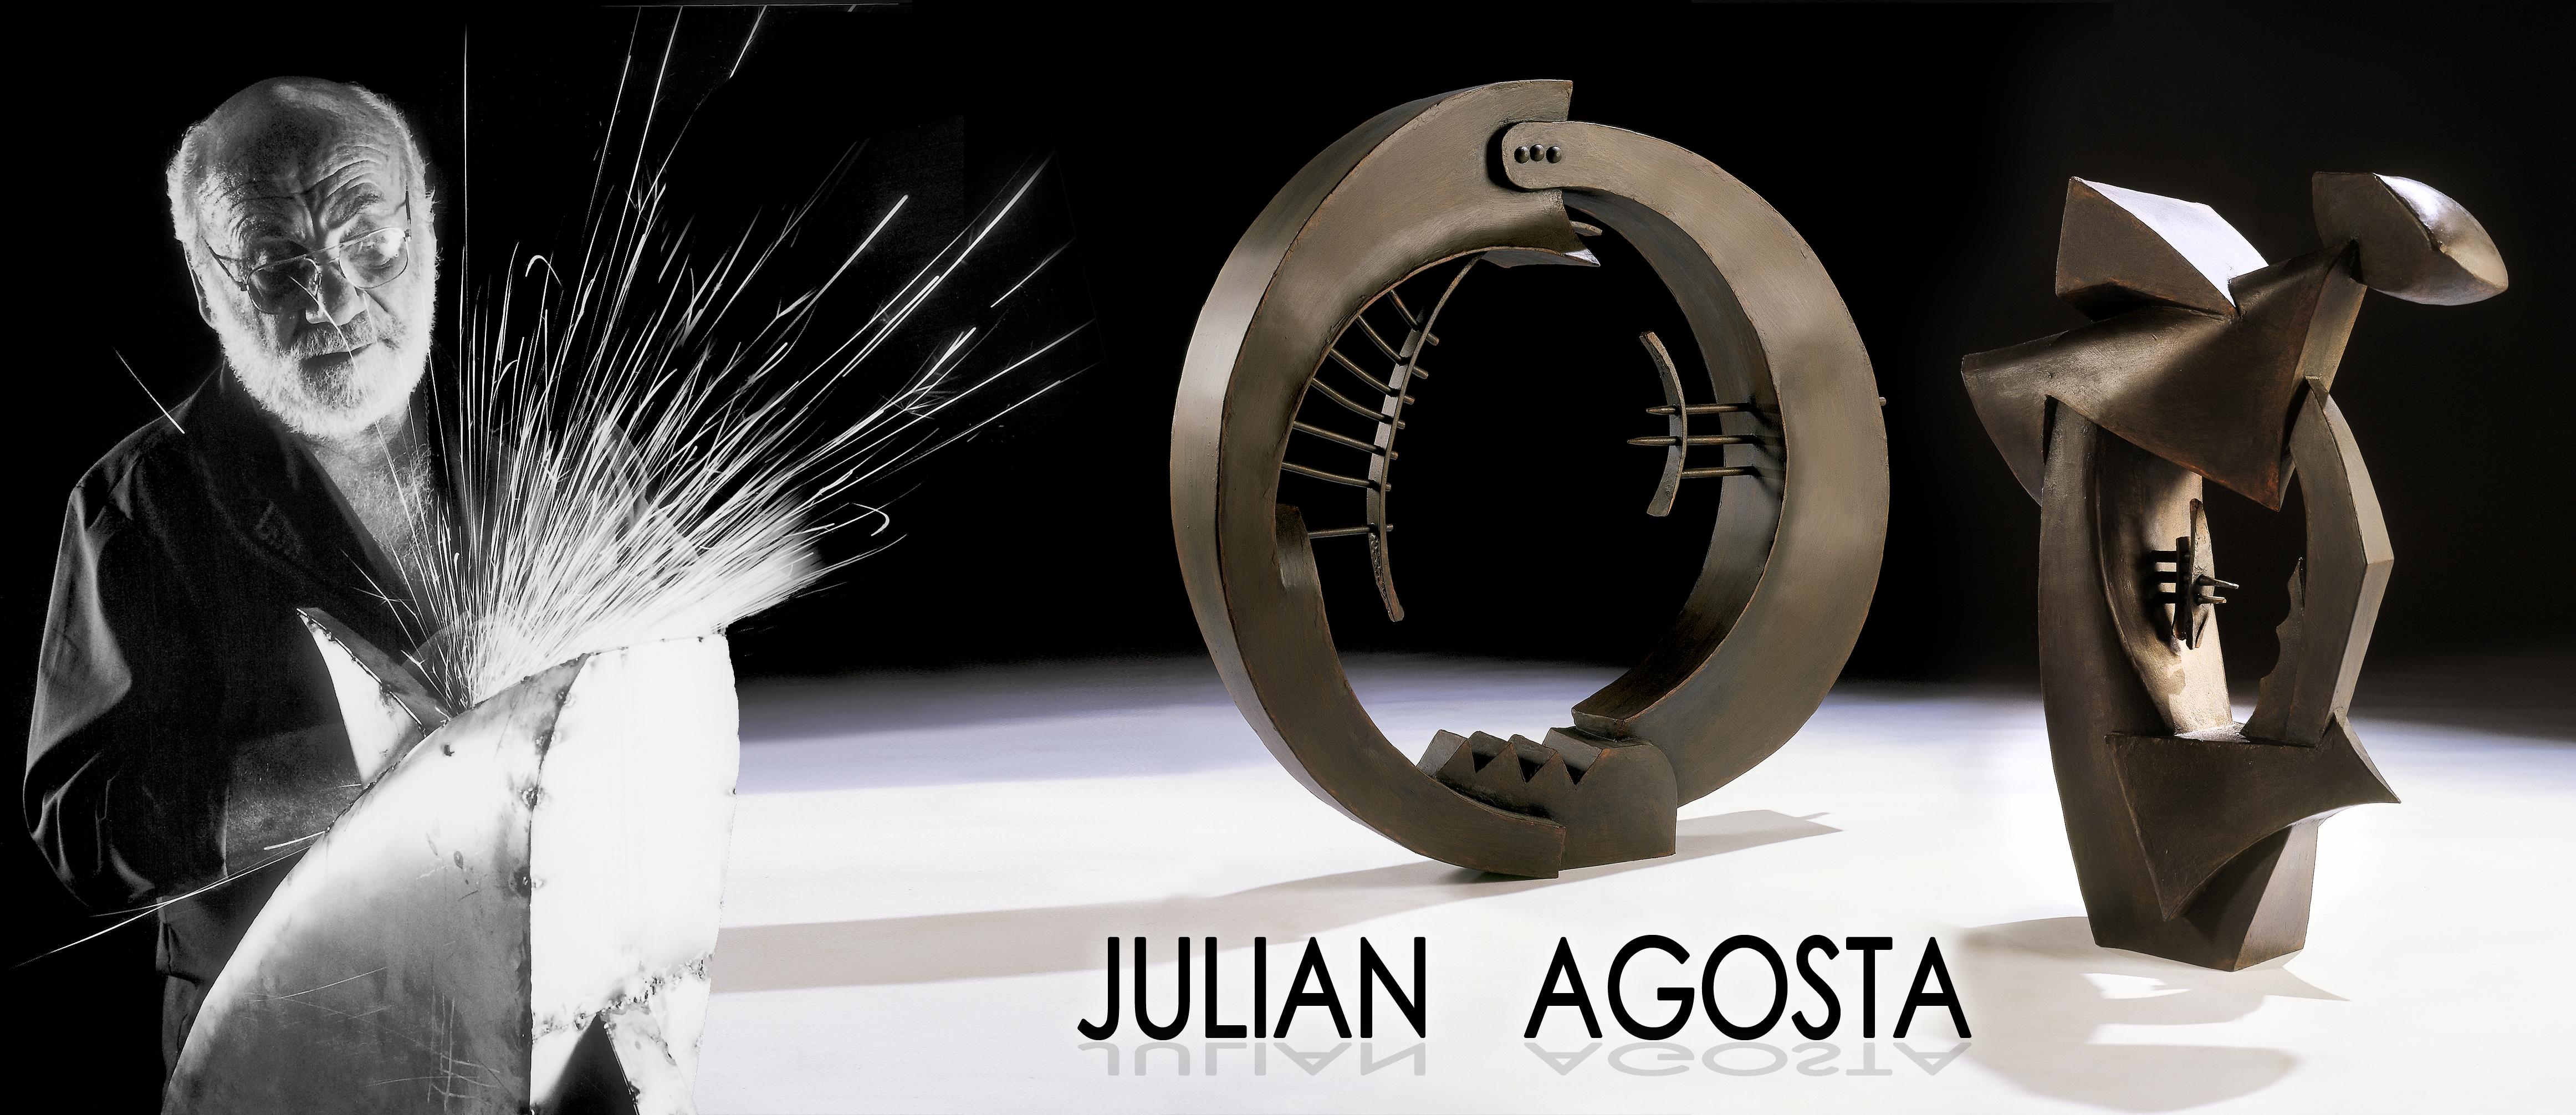 Julian Agosta (21)